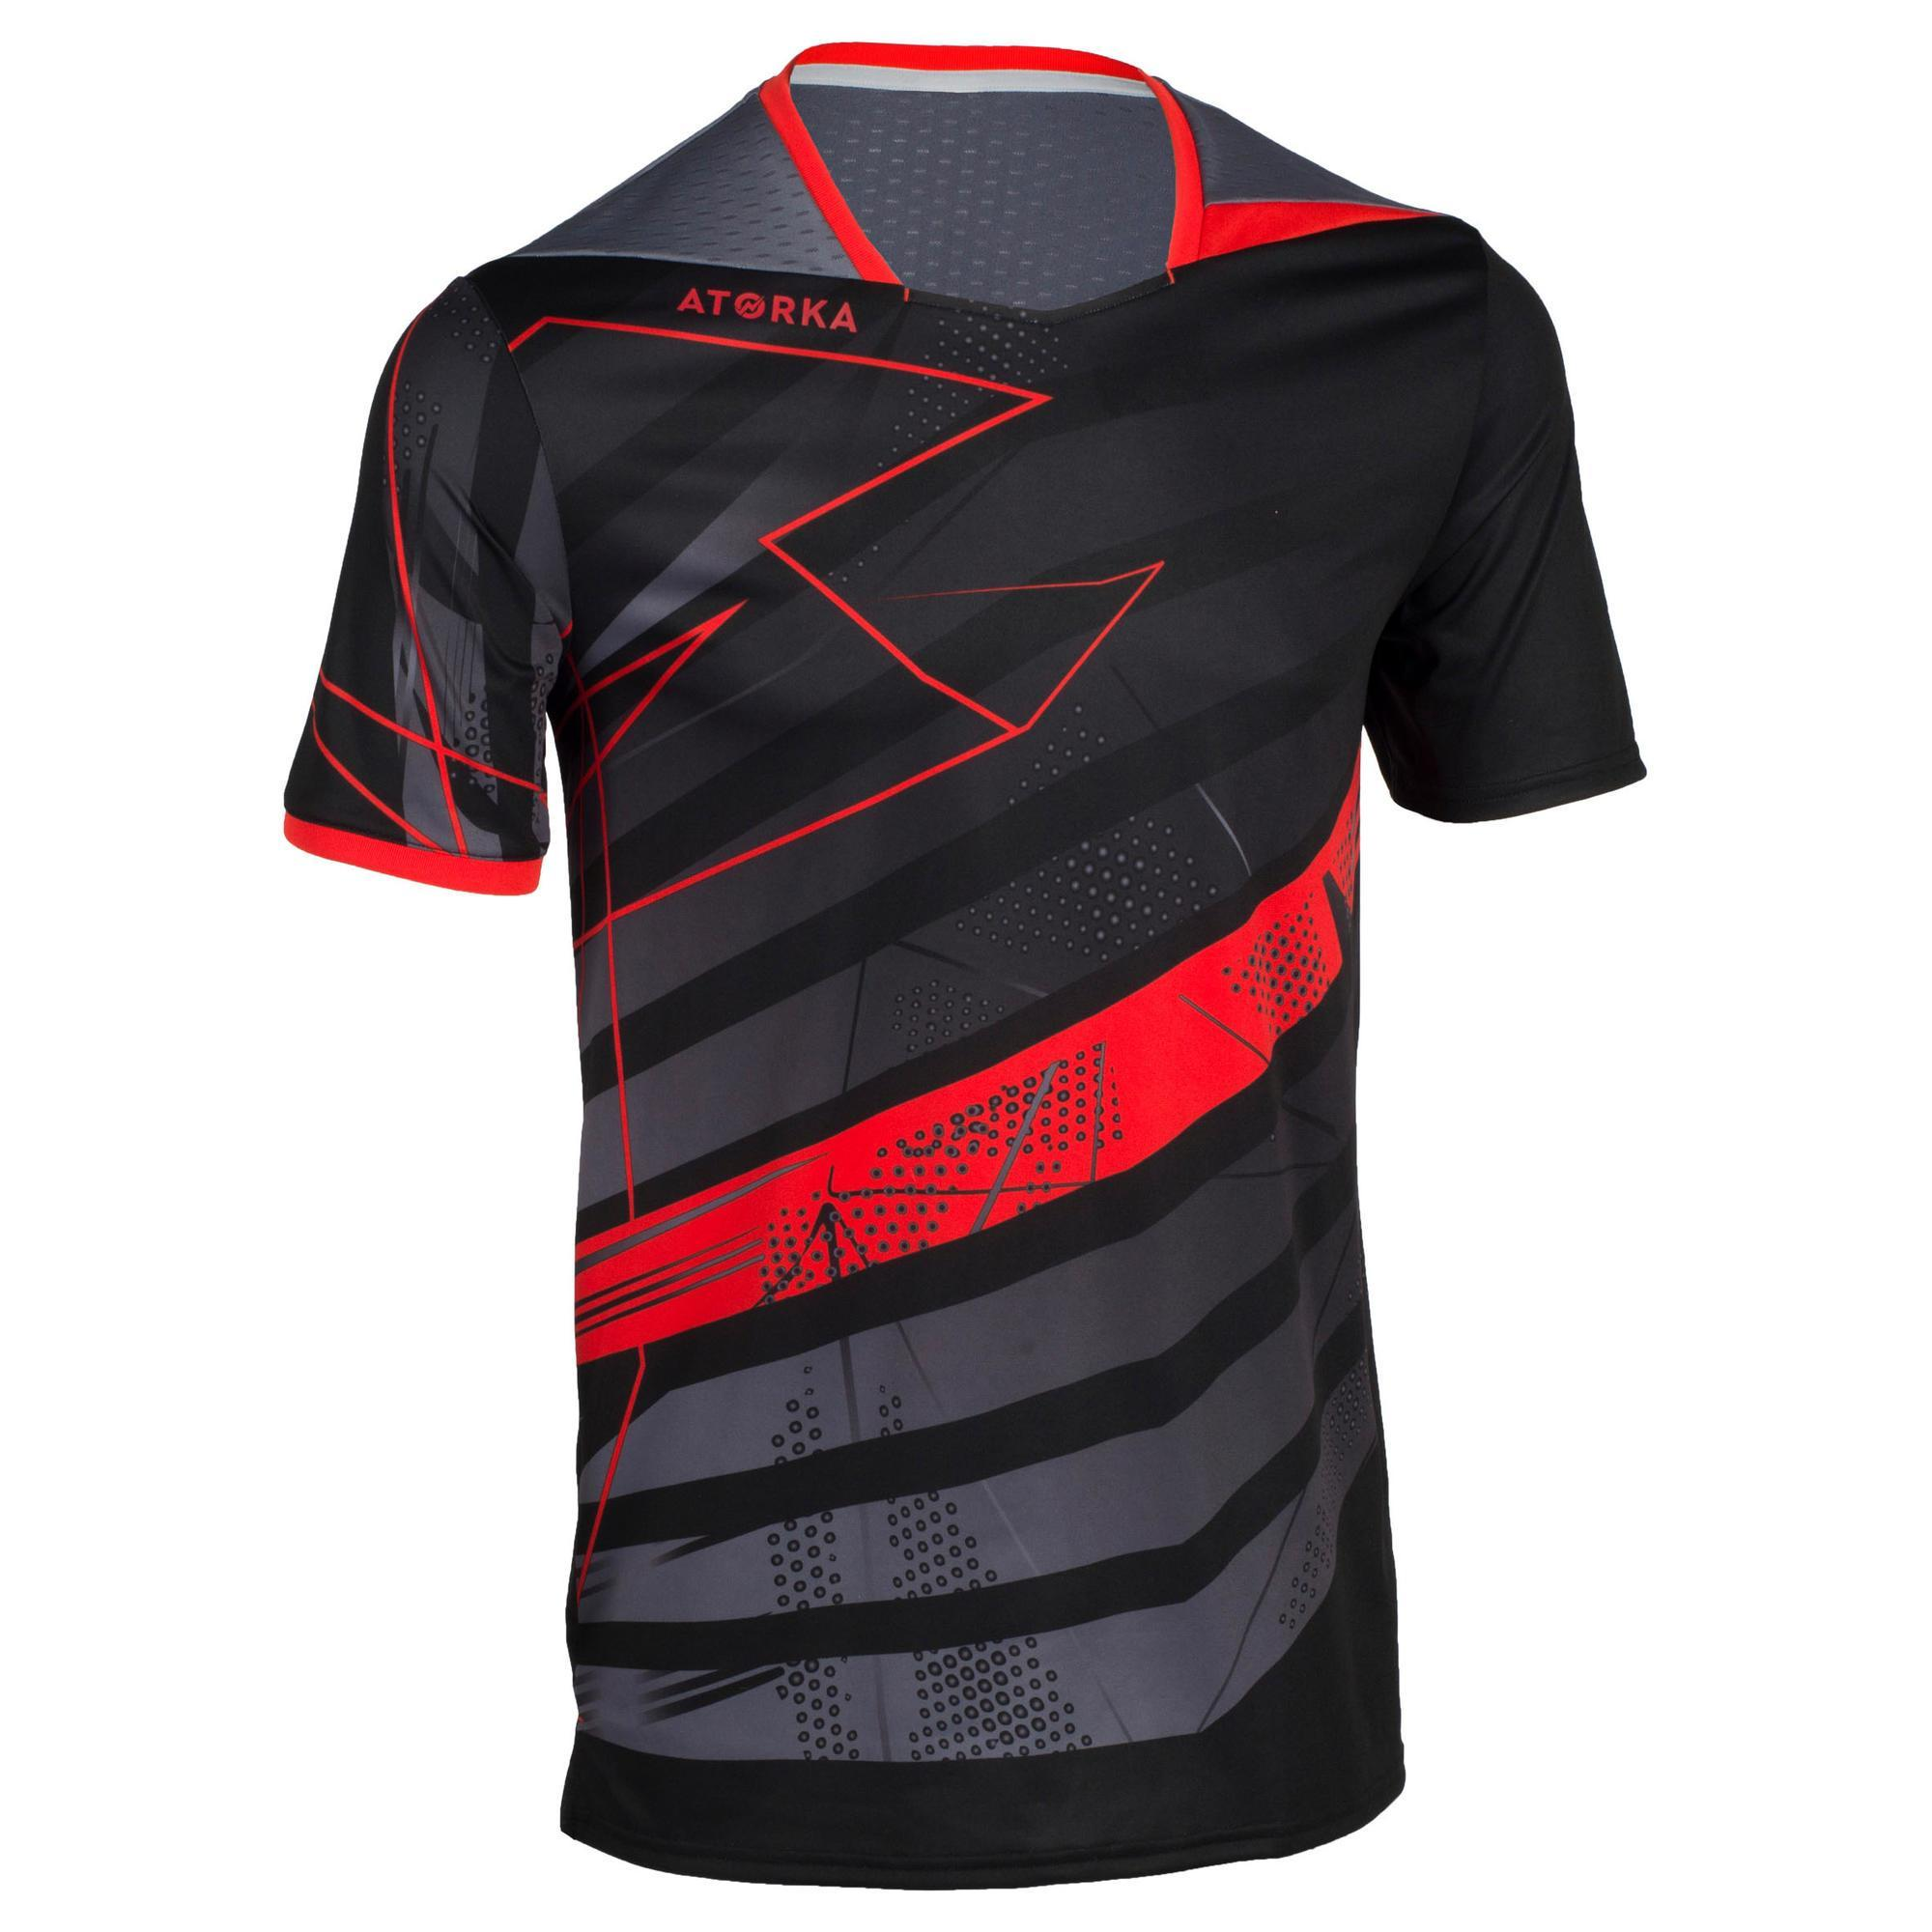 Handballtrikot H500 Herren schwarz/rot | Sportbekleidung > Trikots > Handballtrikots | Atorka